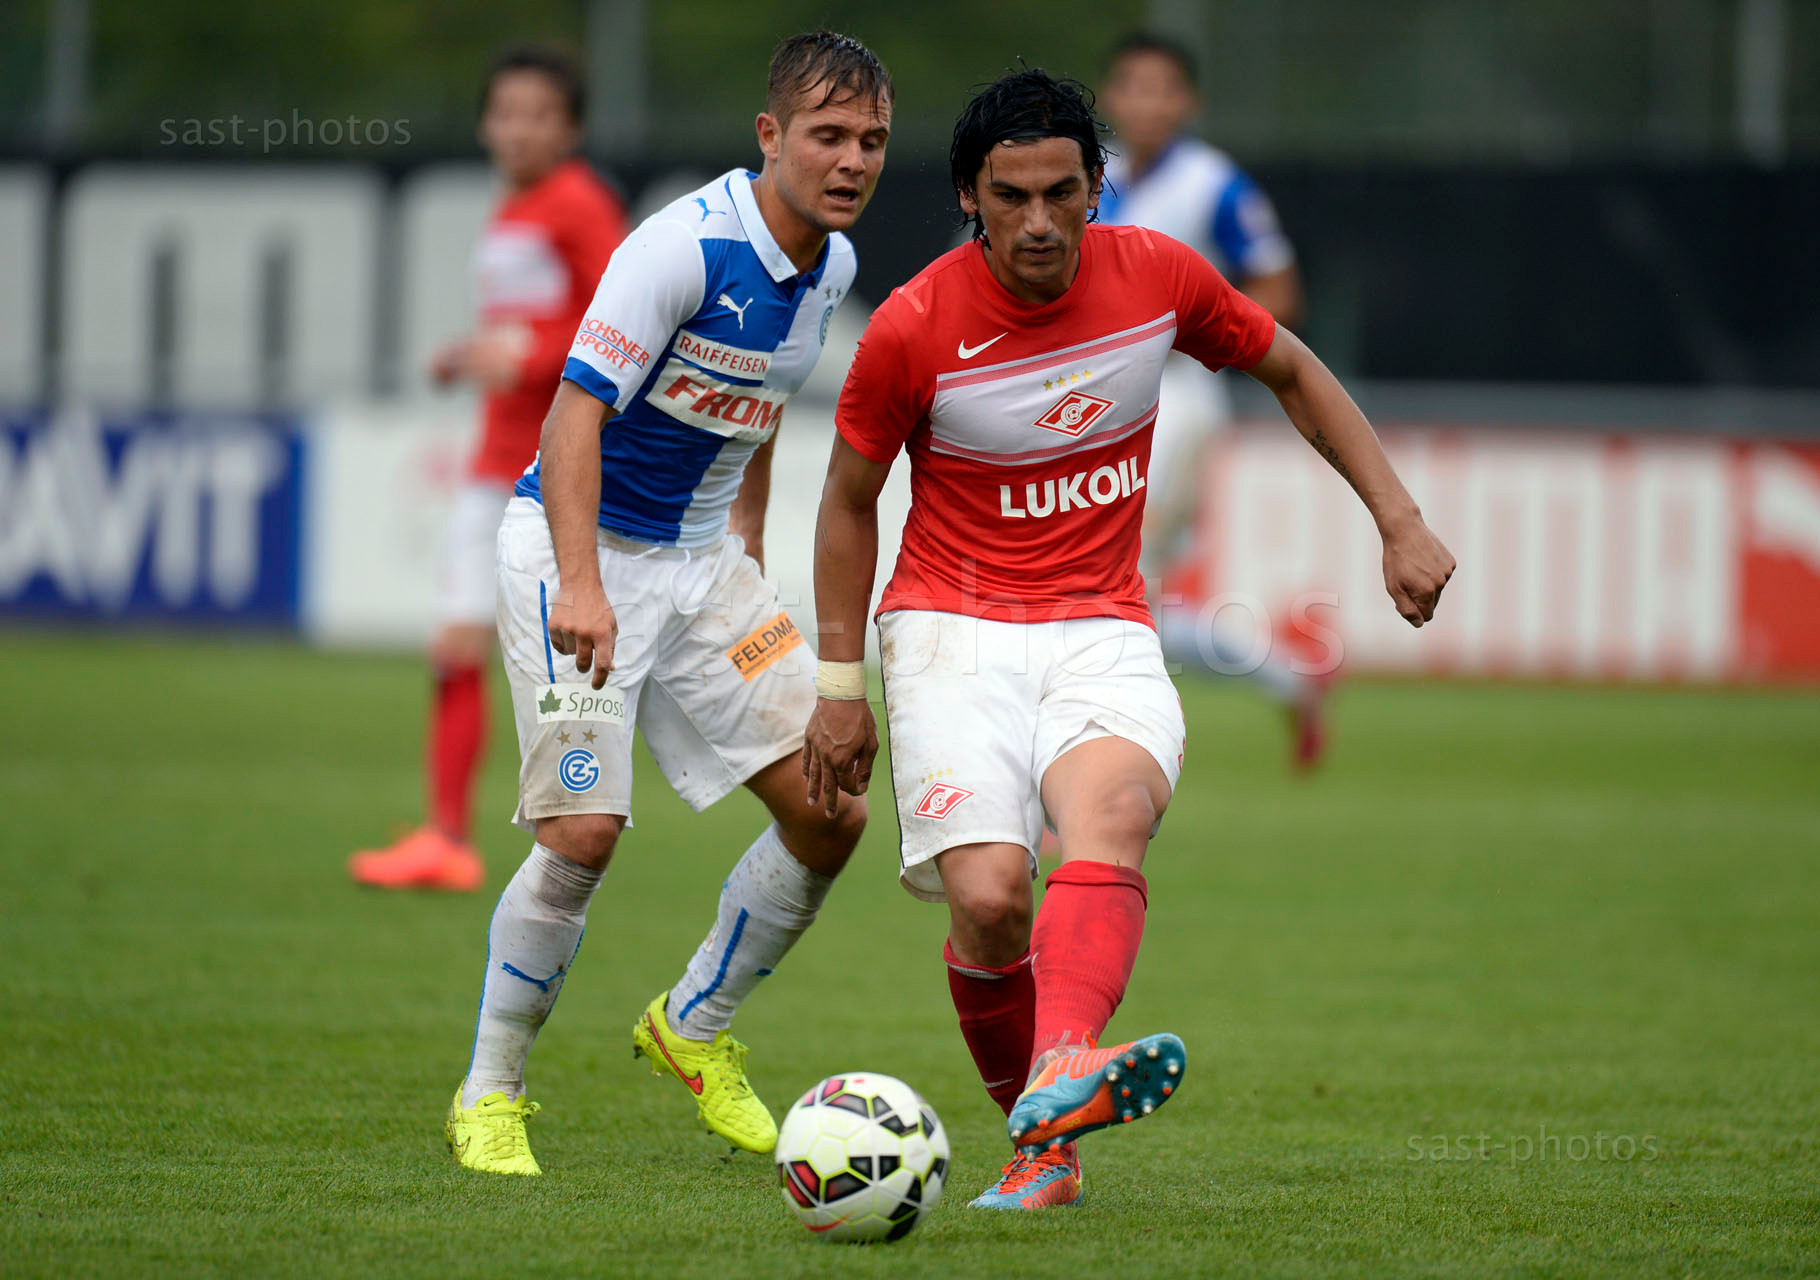 Amir Abrashi (GCZ) gegen Alberto Facundo Costa (Spartak)